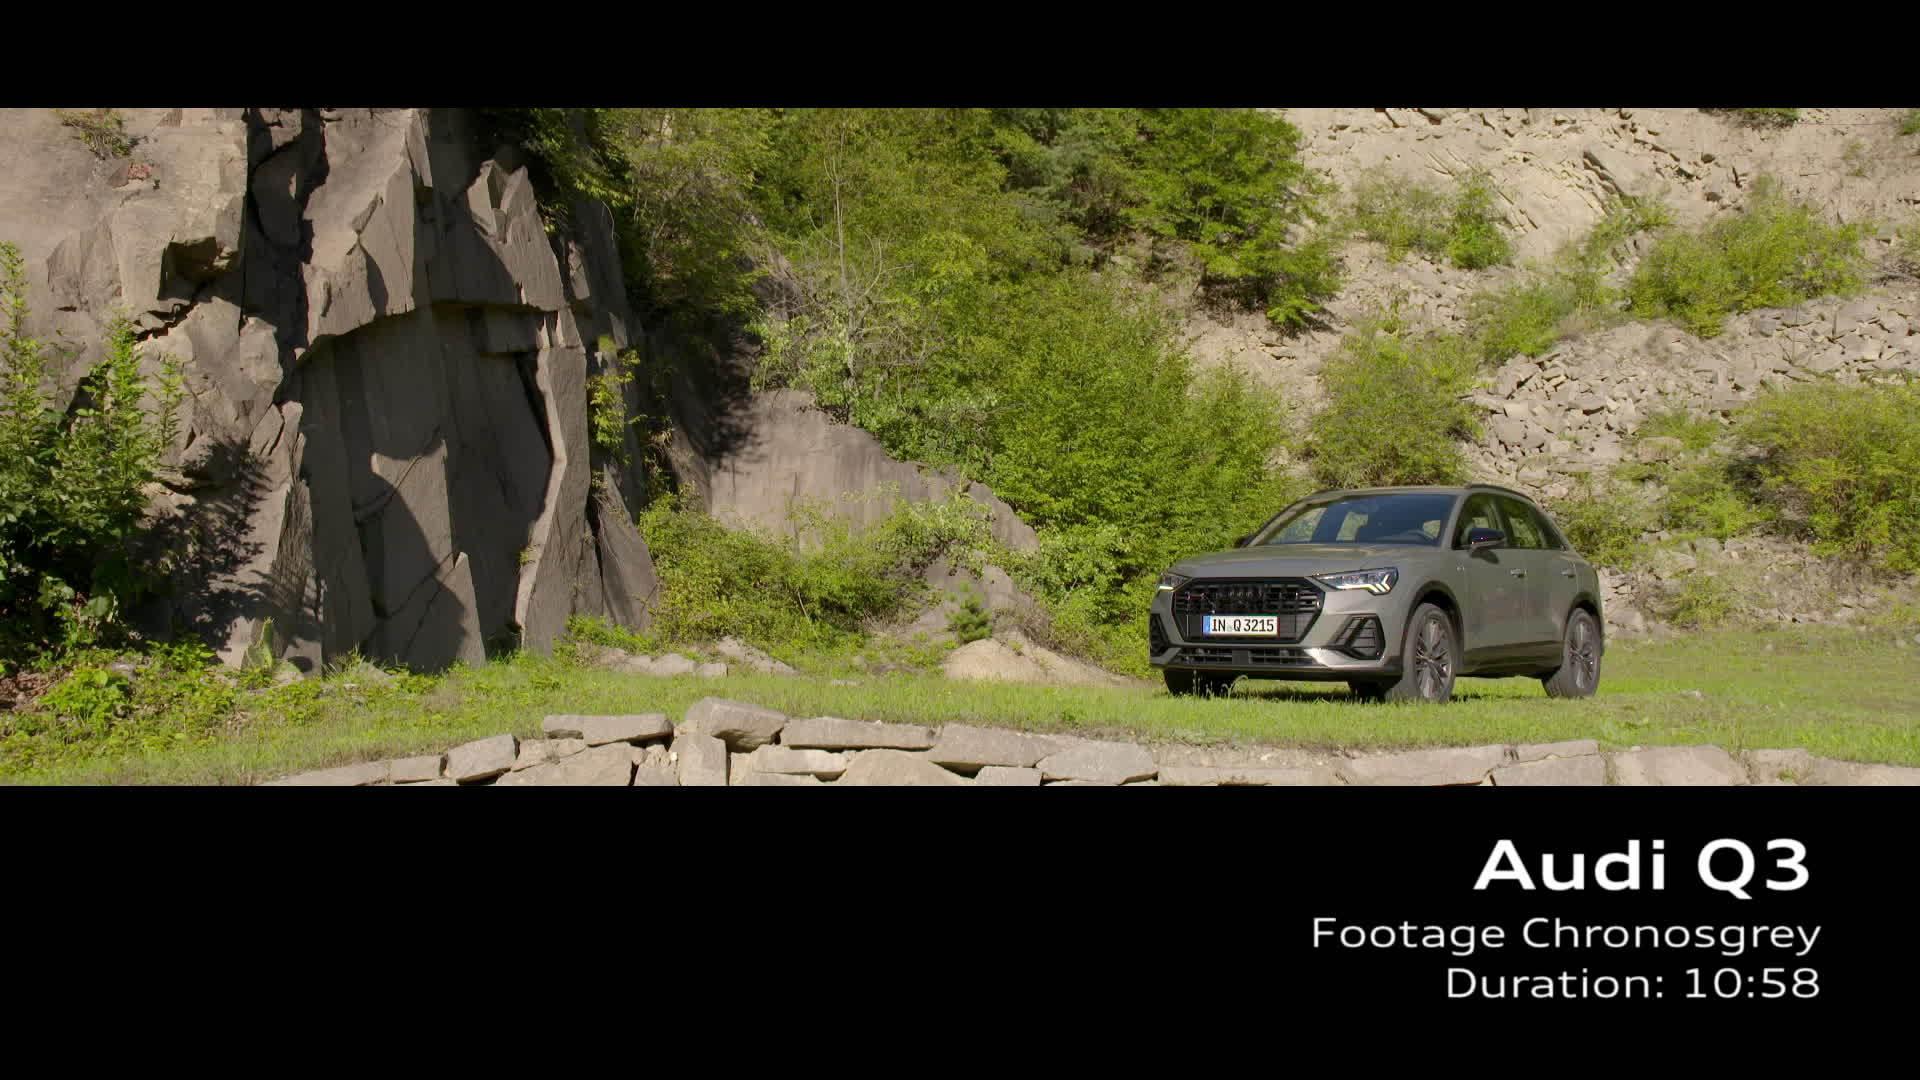 Audi Q3 – On Location Footage Chronos Grau